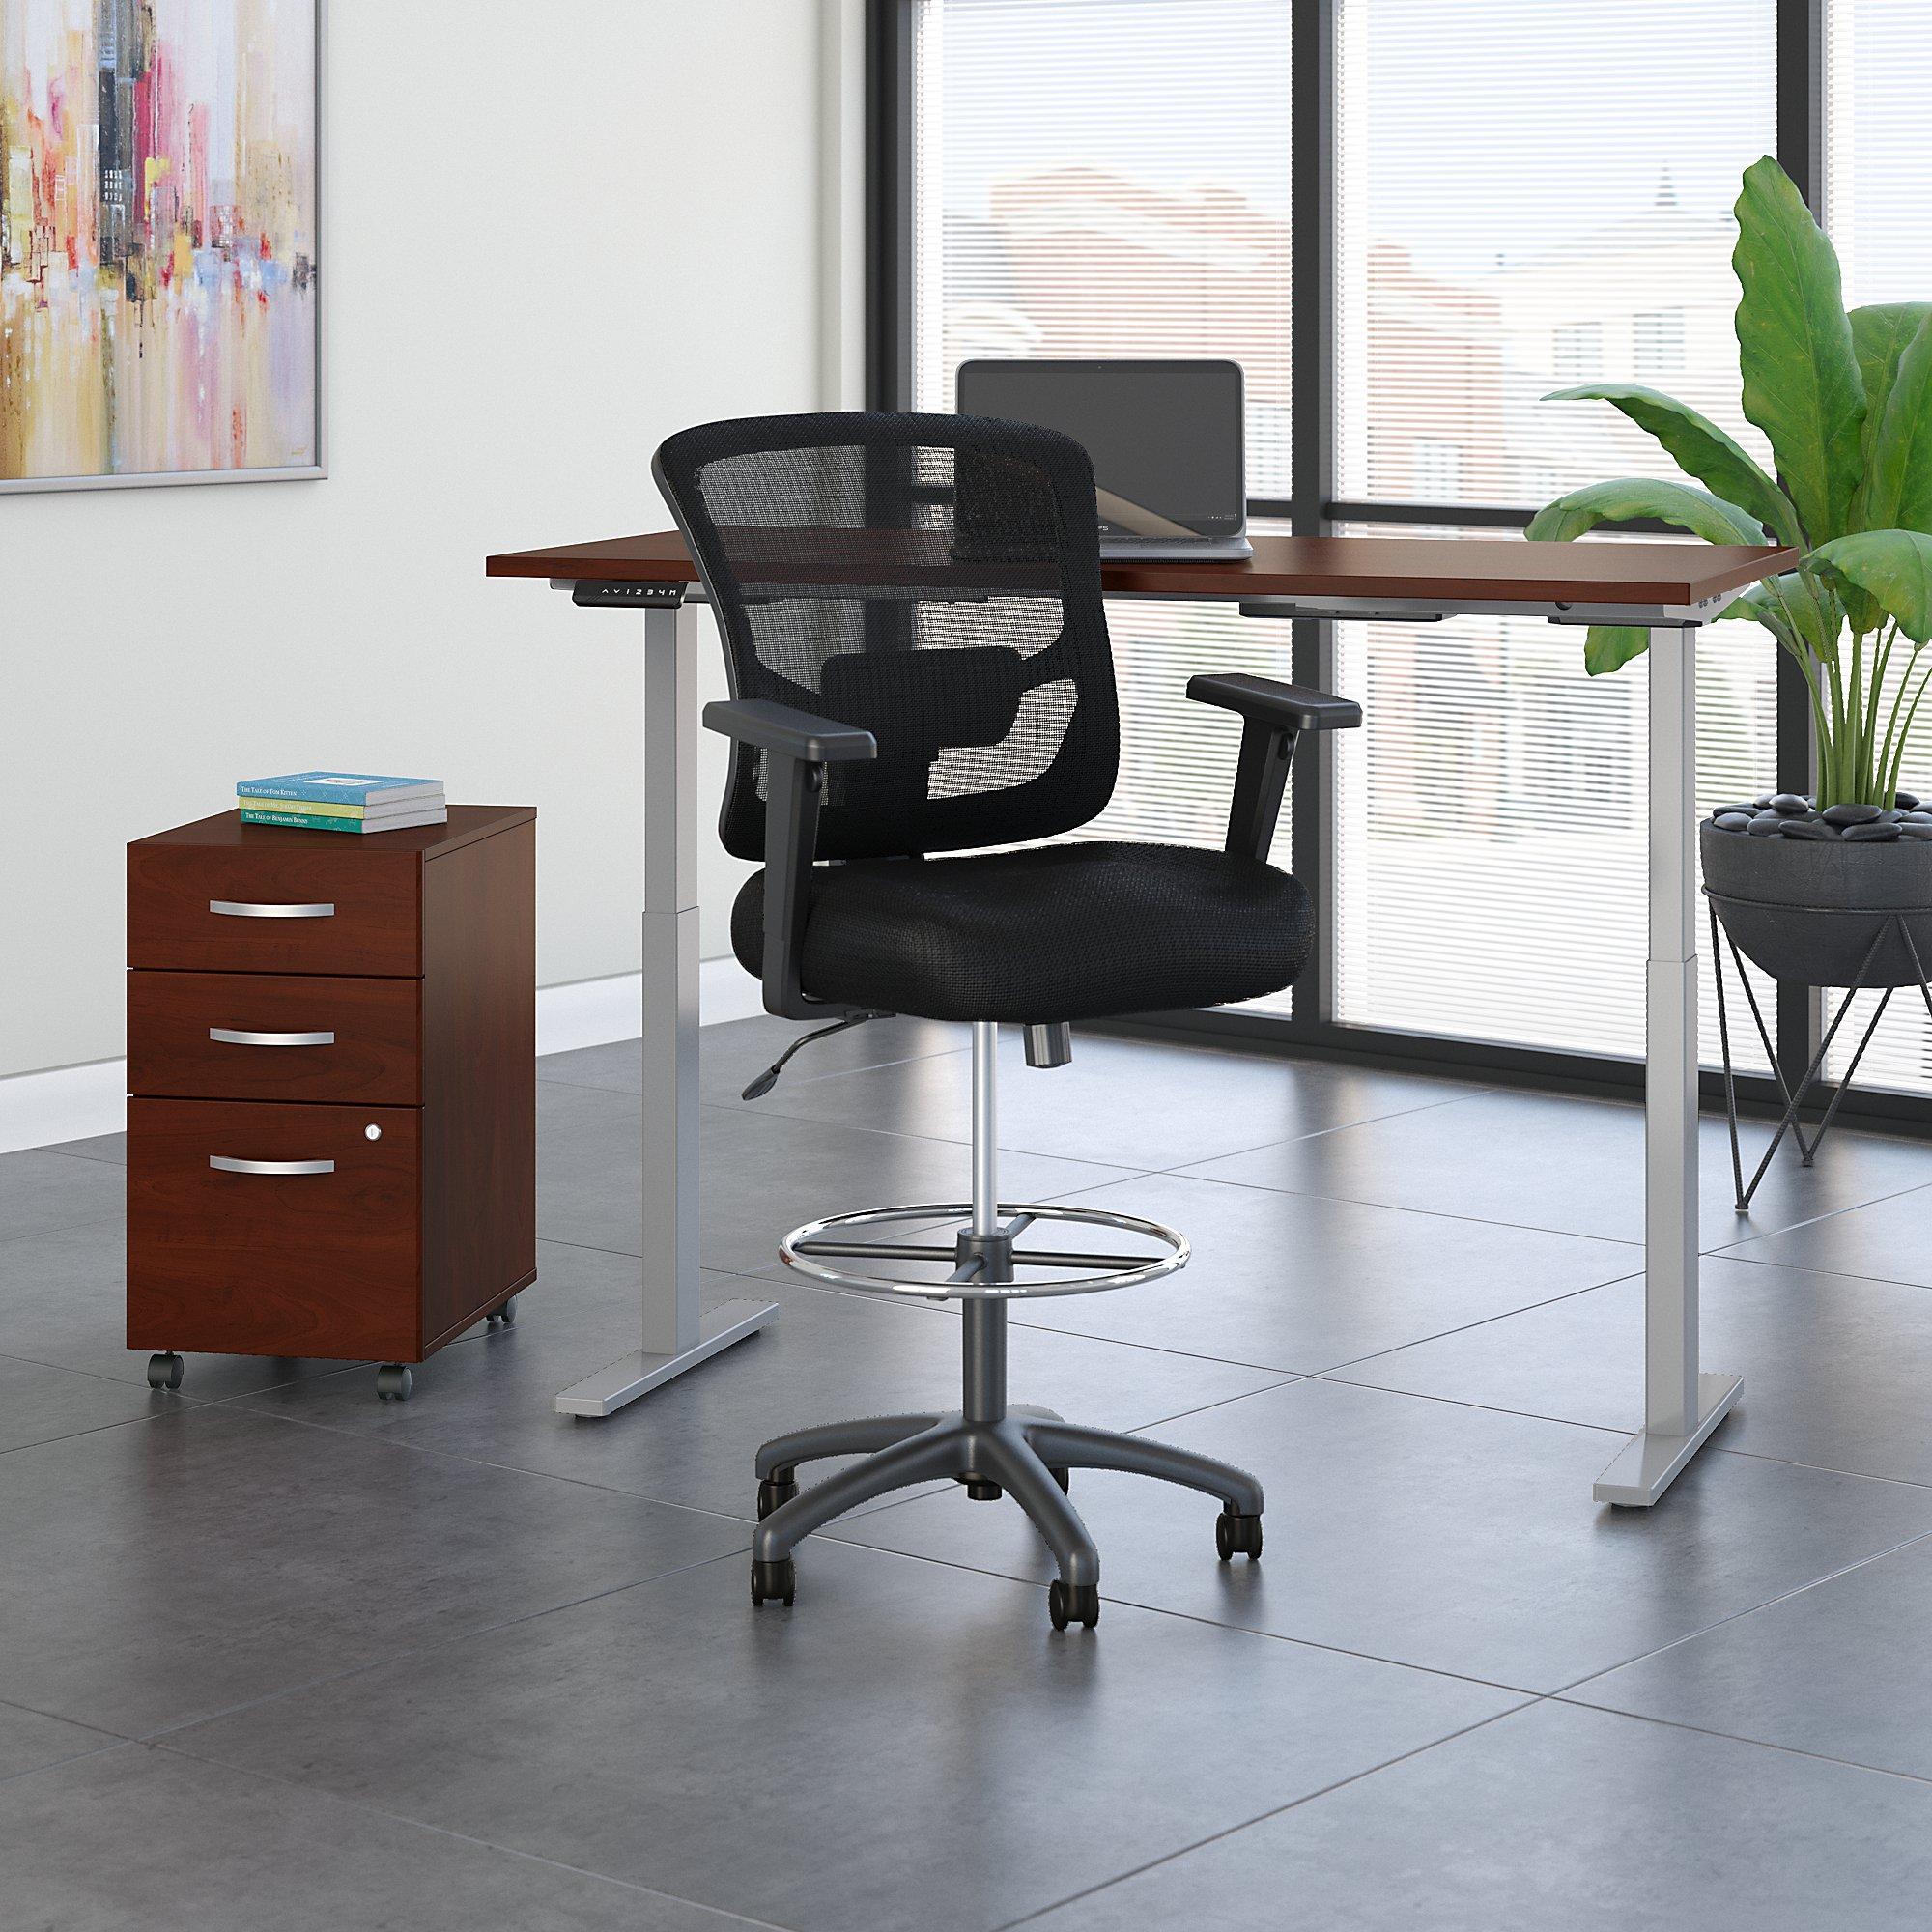 hansen cherry ergonomic desk with drafting chair and storage